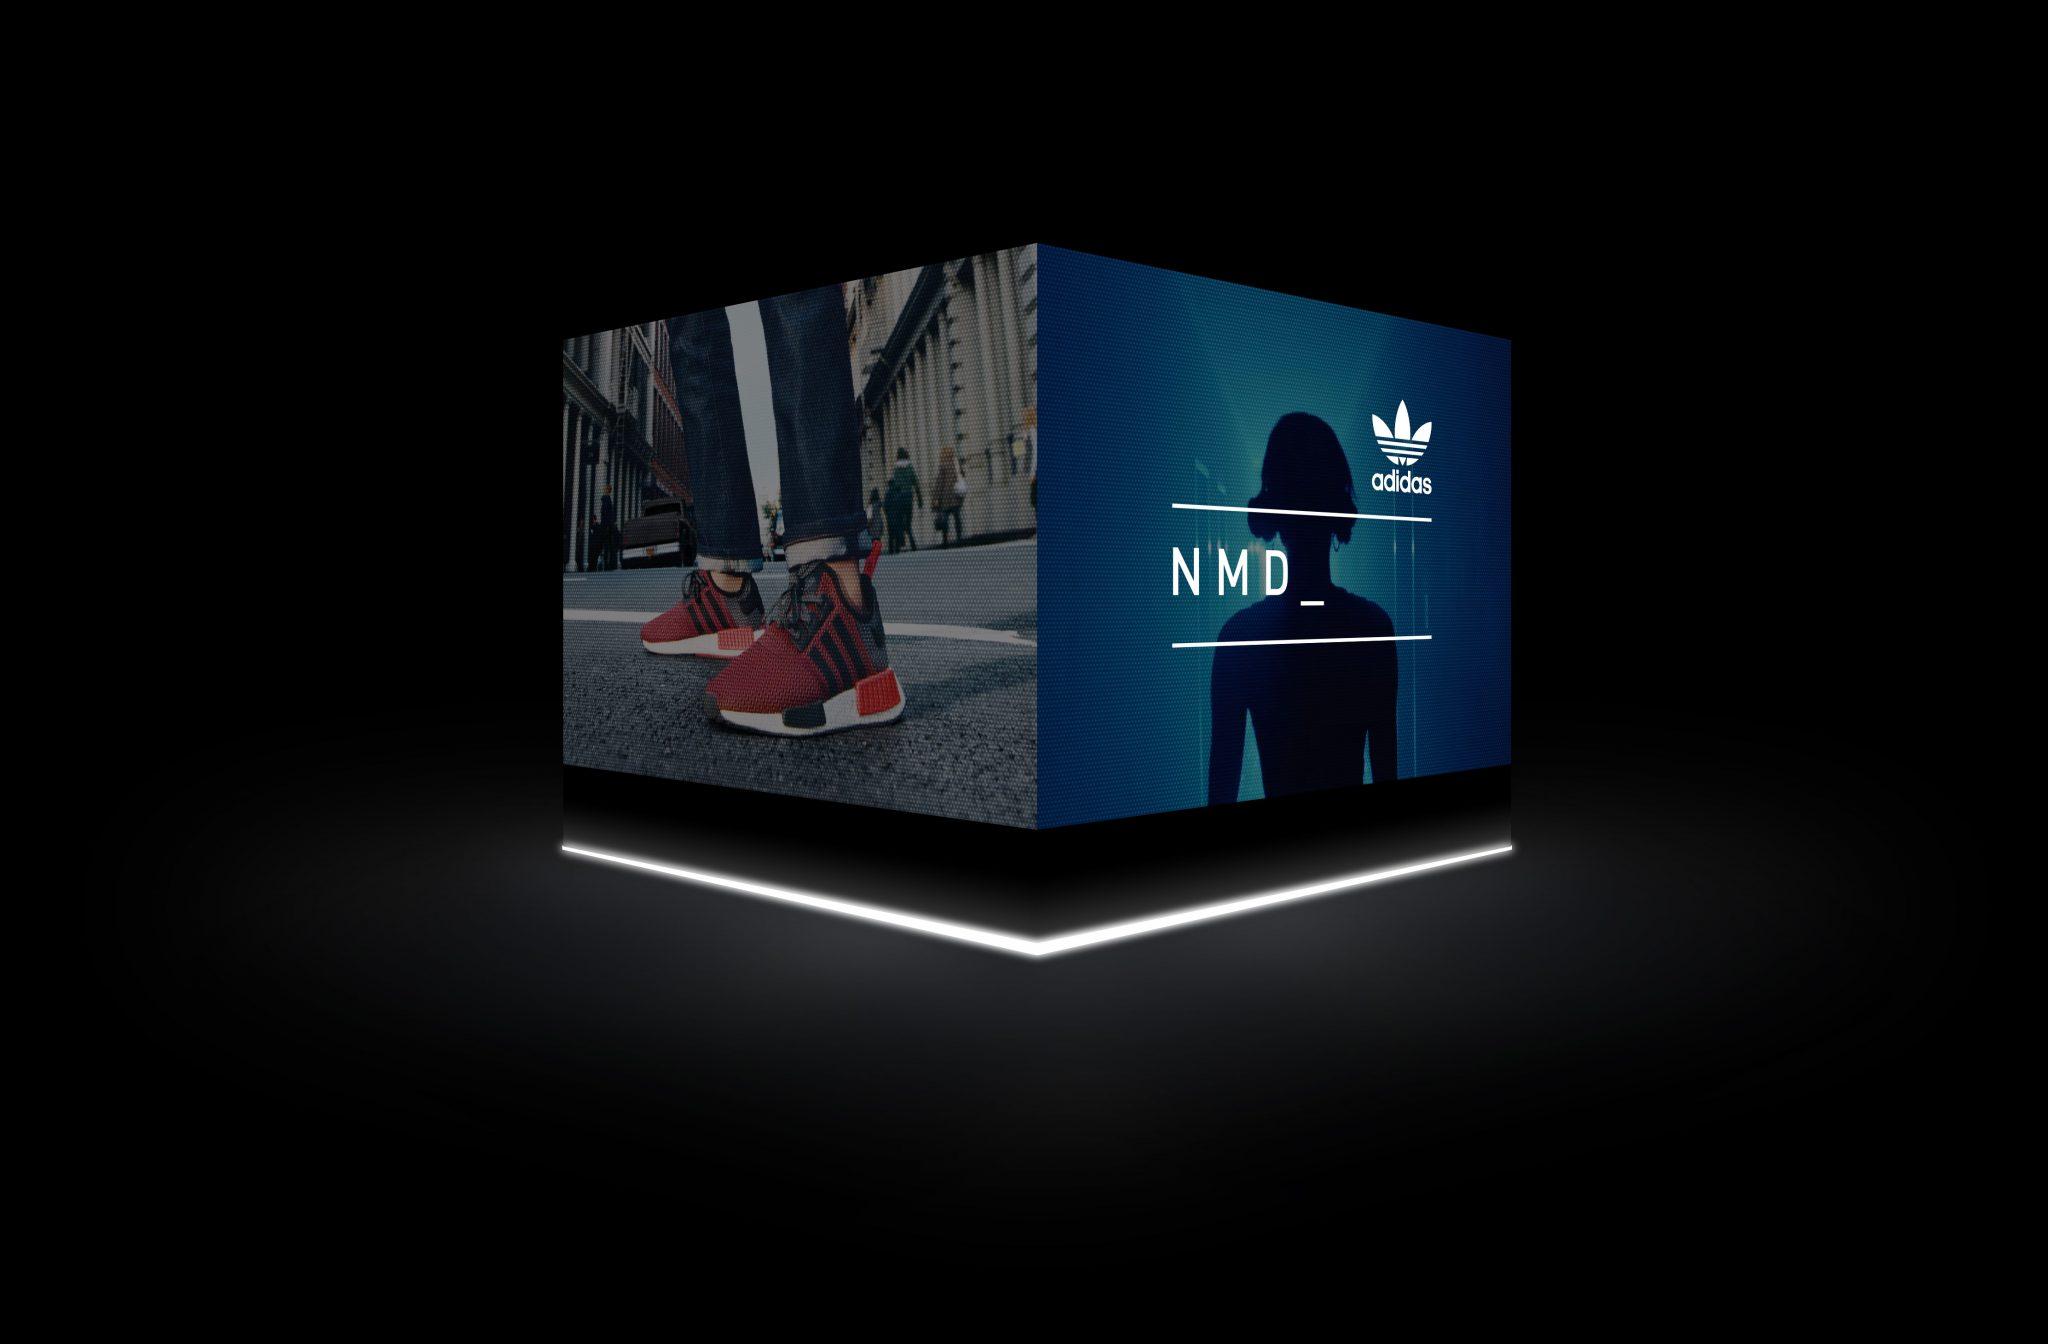 Le nuove adidas Originals NMD iconica sneaker